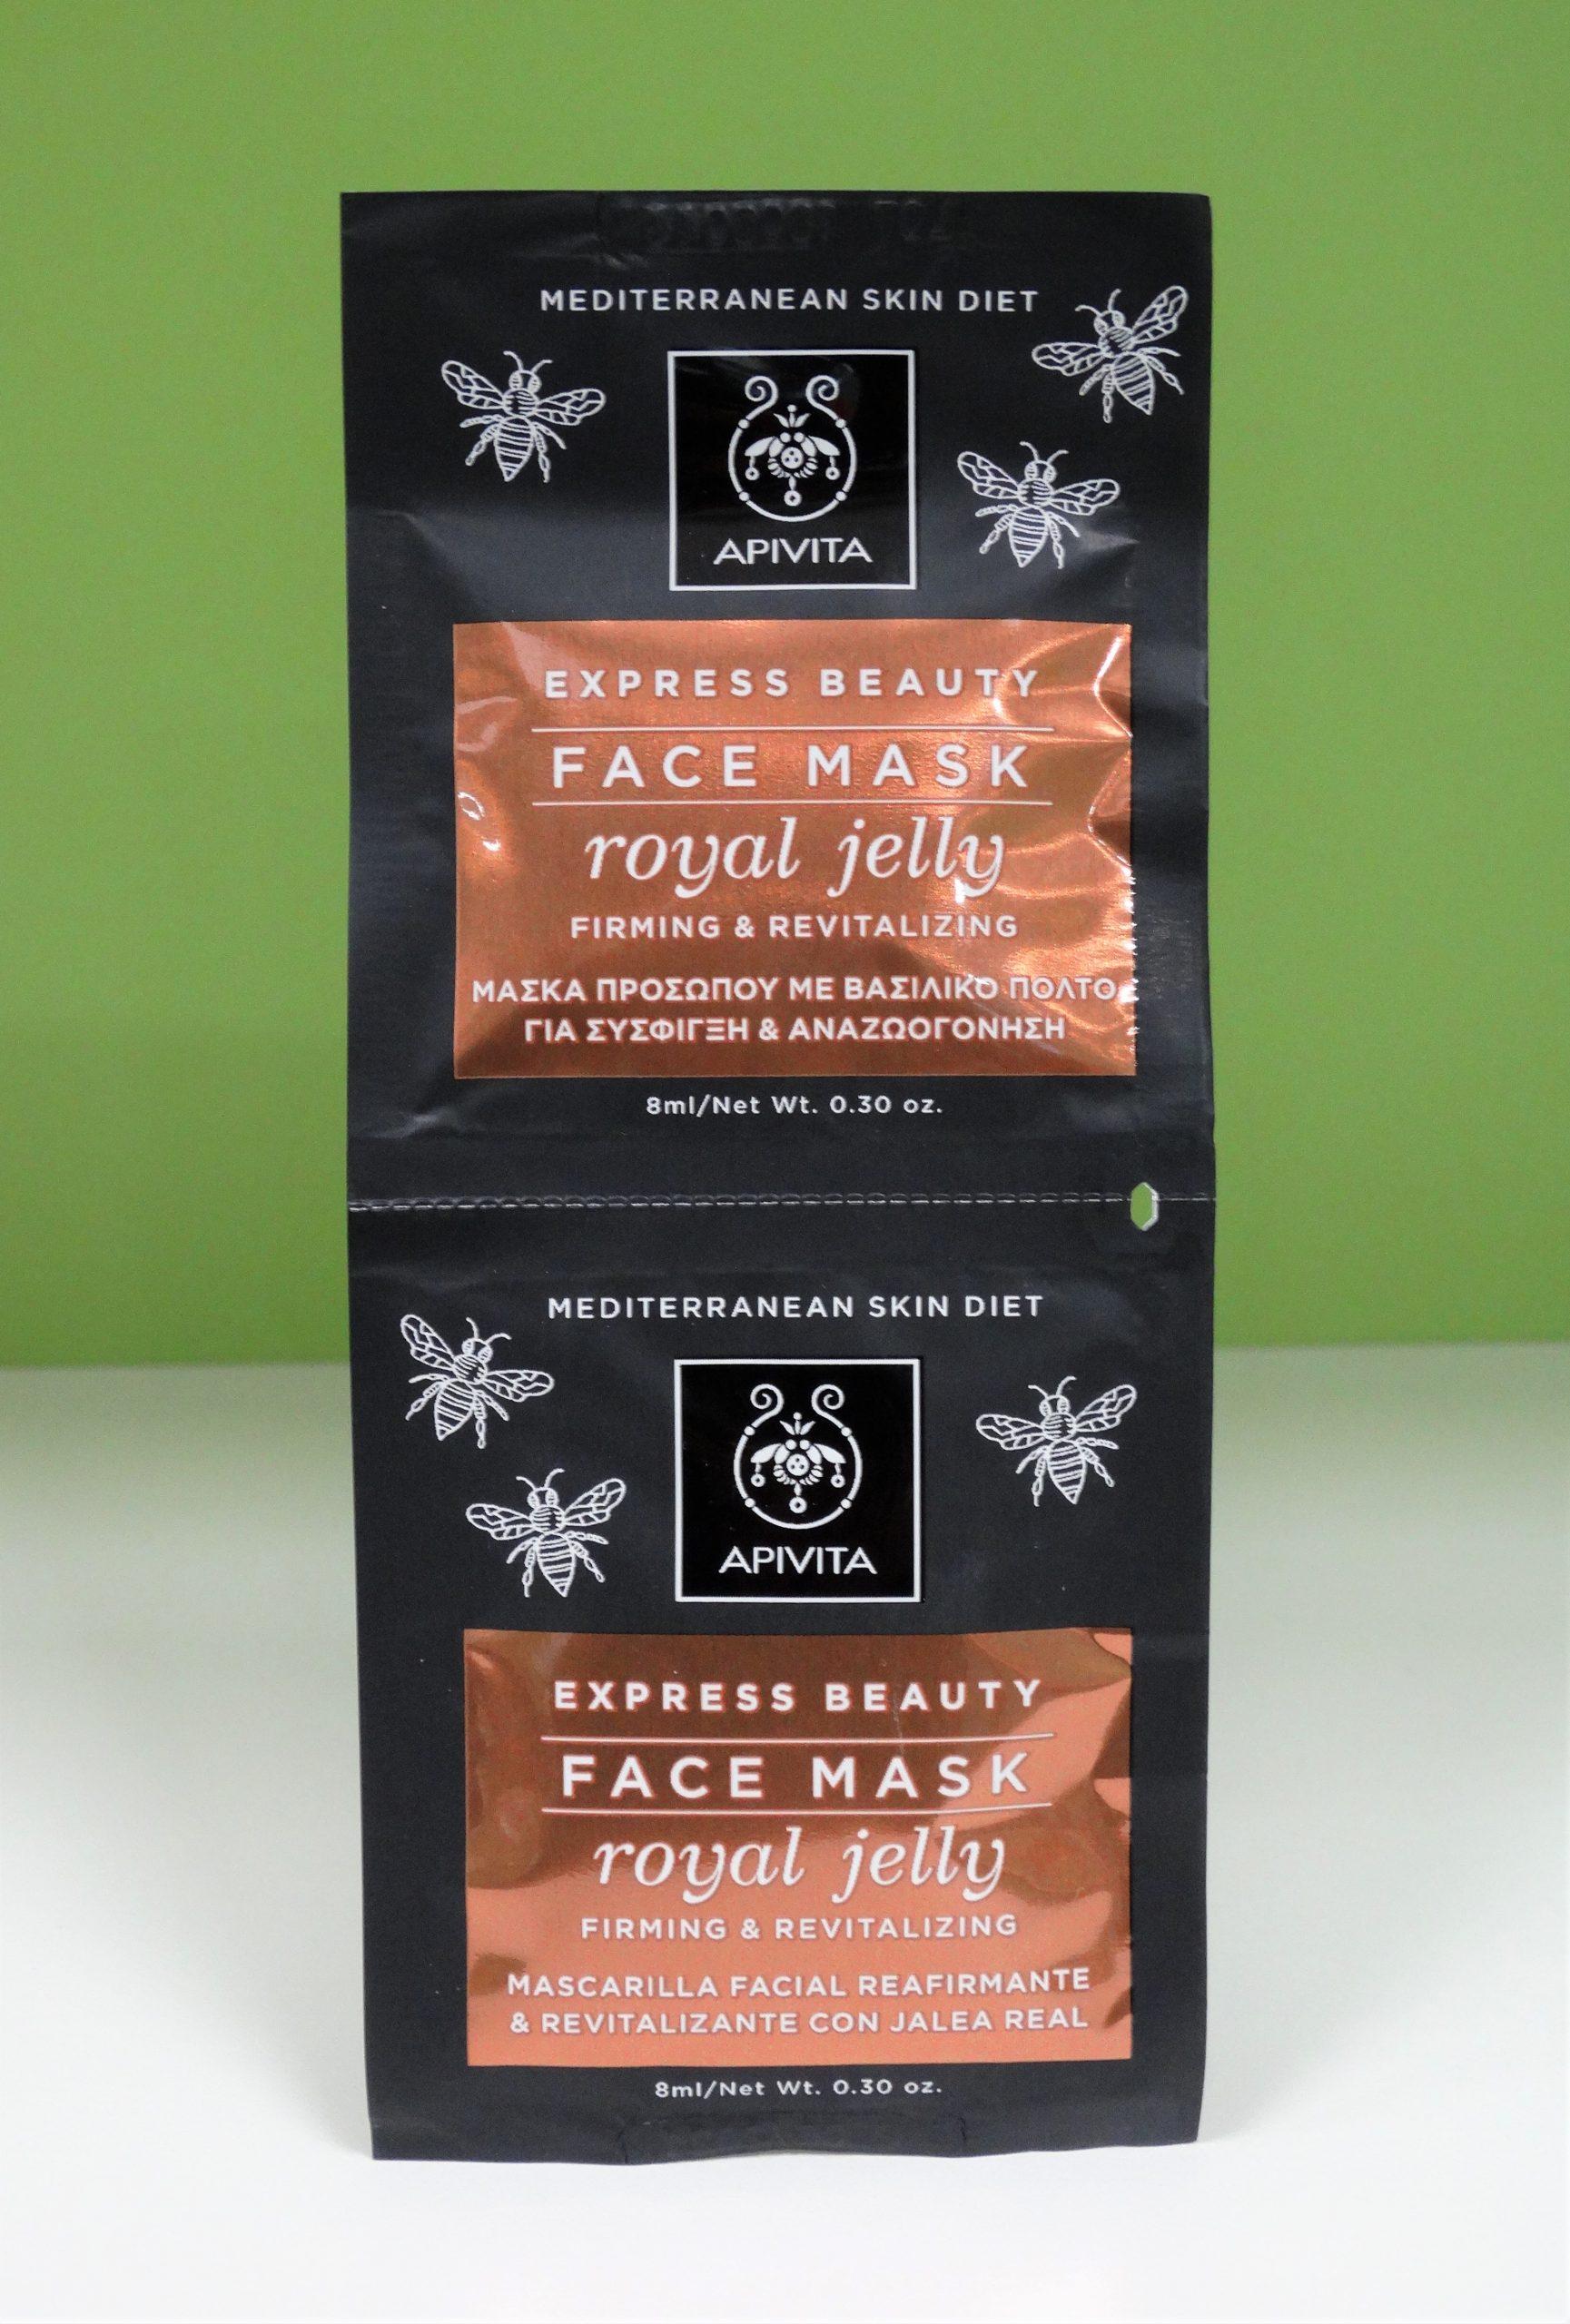 APIVITA Mascarilla Facial Reafirmante con Jalea Real GOLD Face Mask Royal Jelly, 50ml